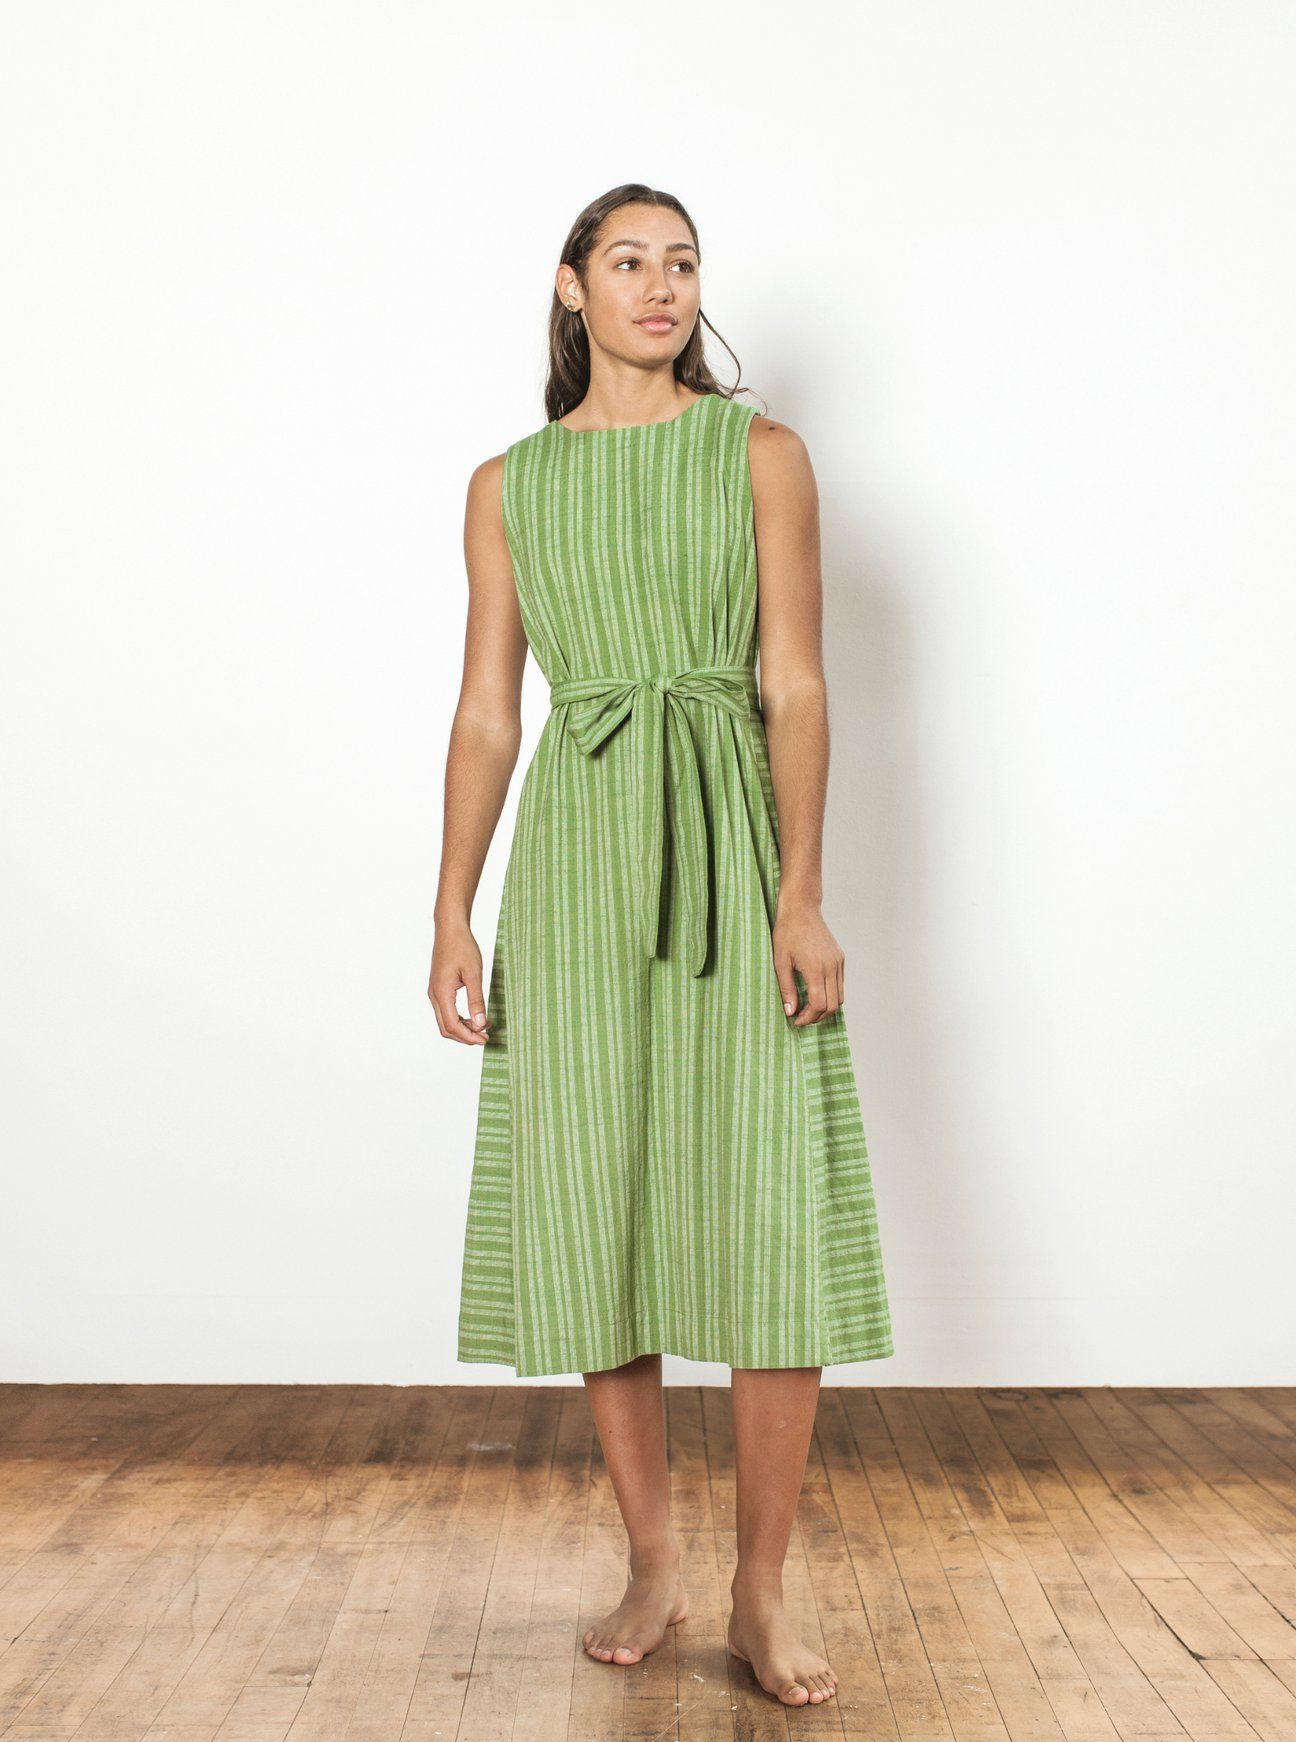 Penny Dress Summer 20 Xxs 2x In 2021 Summer Dresses Dresses Sleeveless Pullover [ 1742 x 1296 Pixel ]